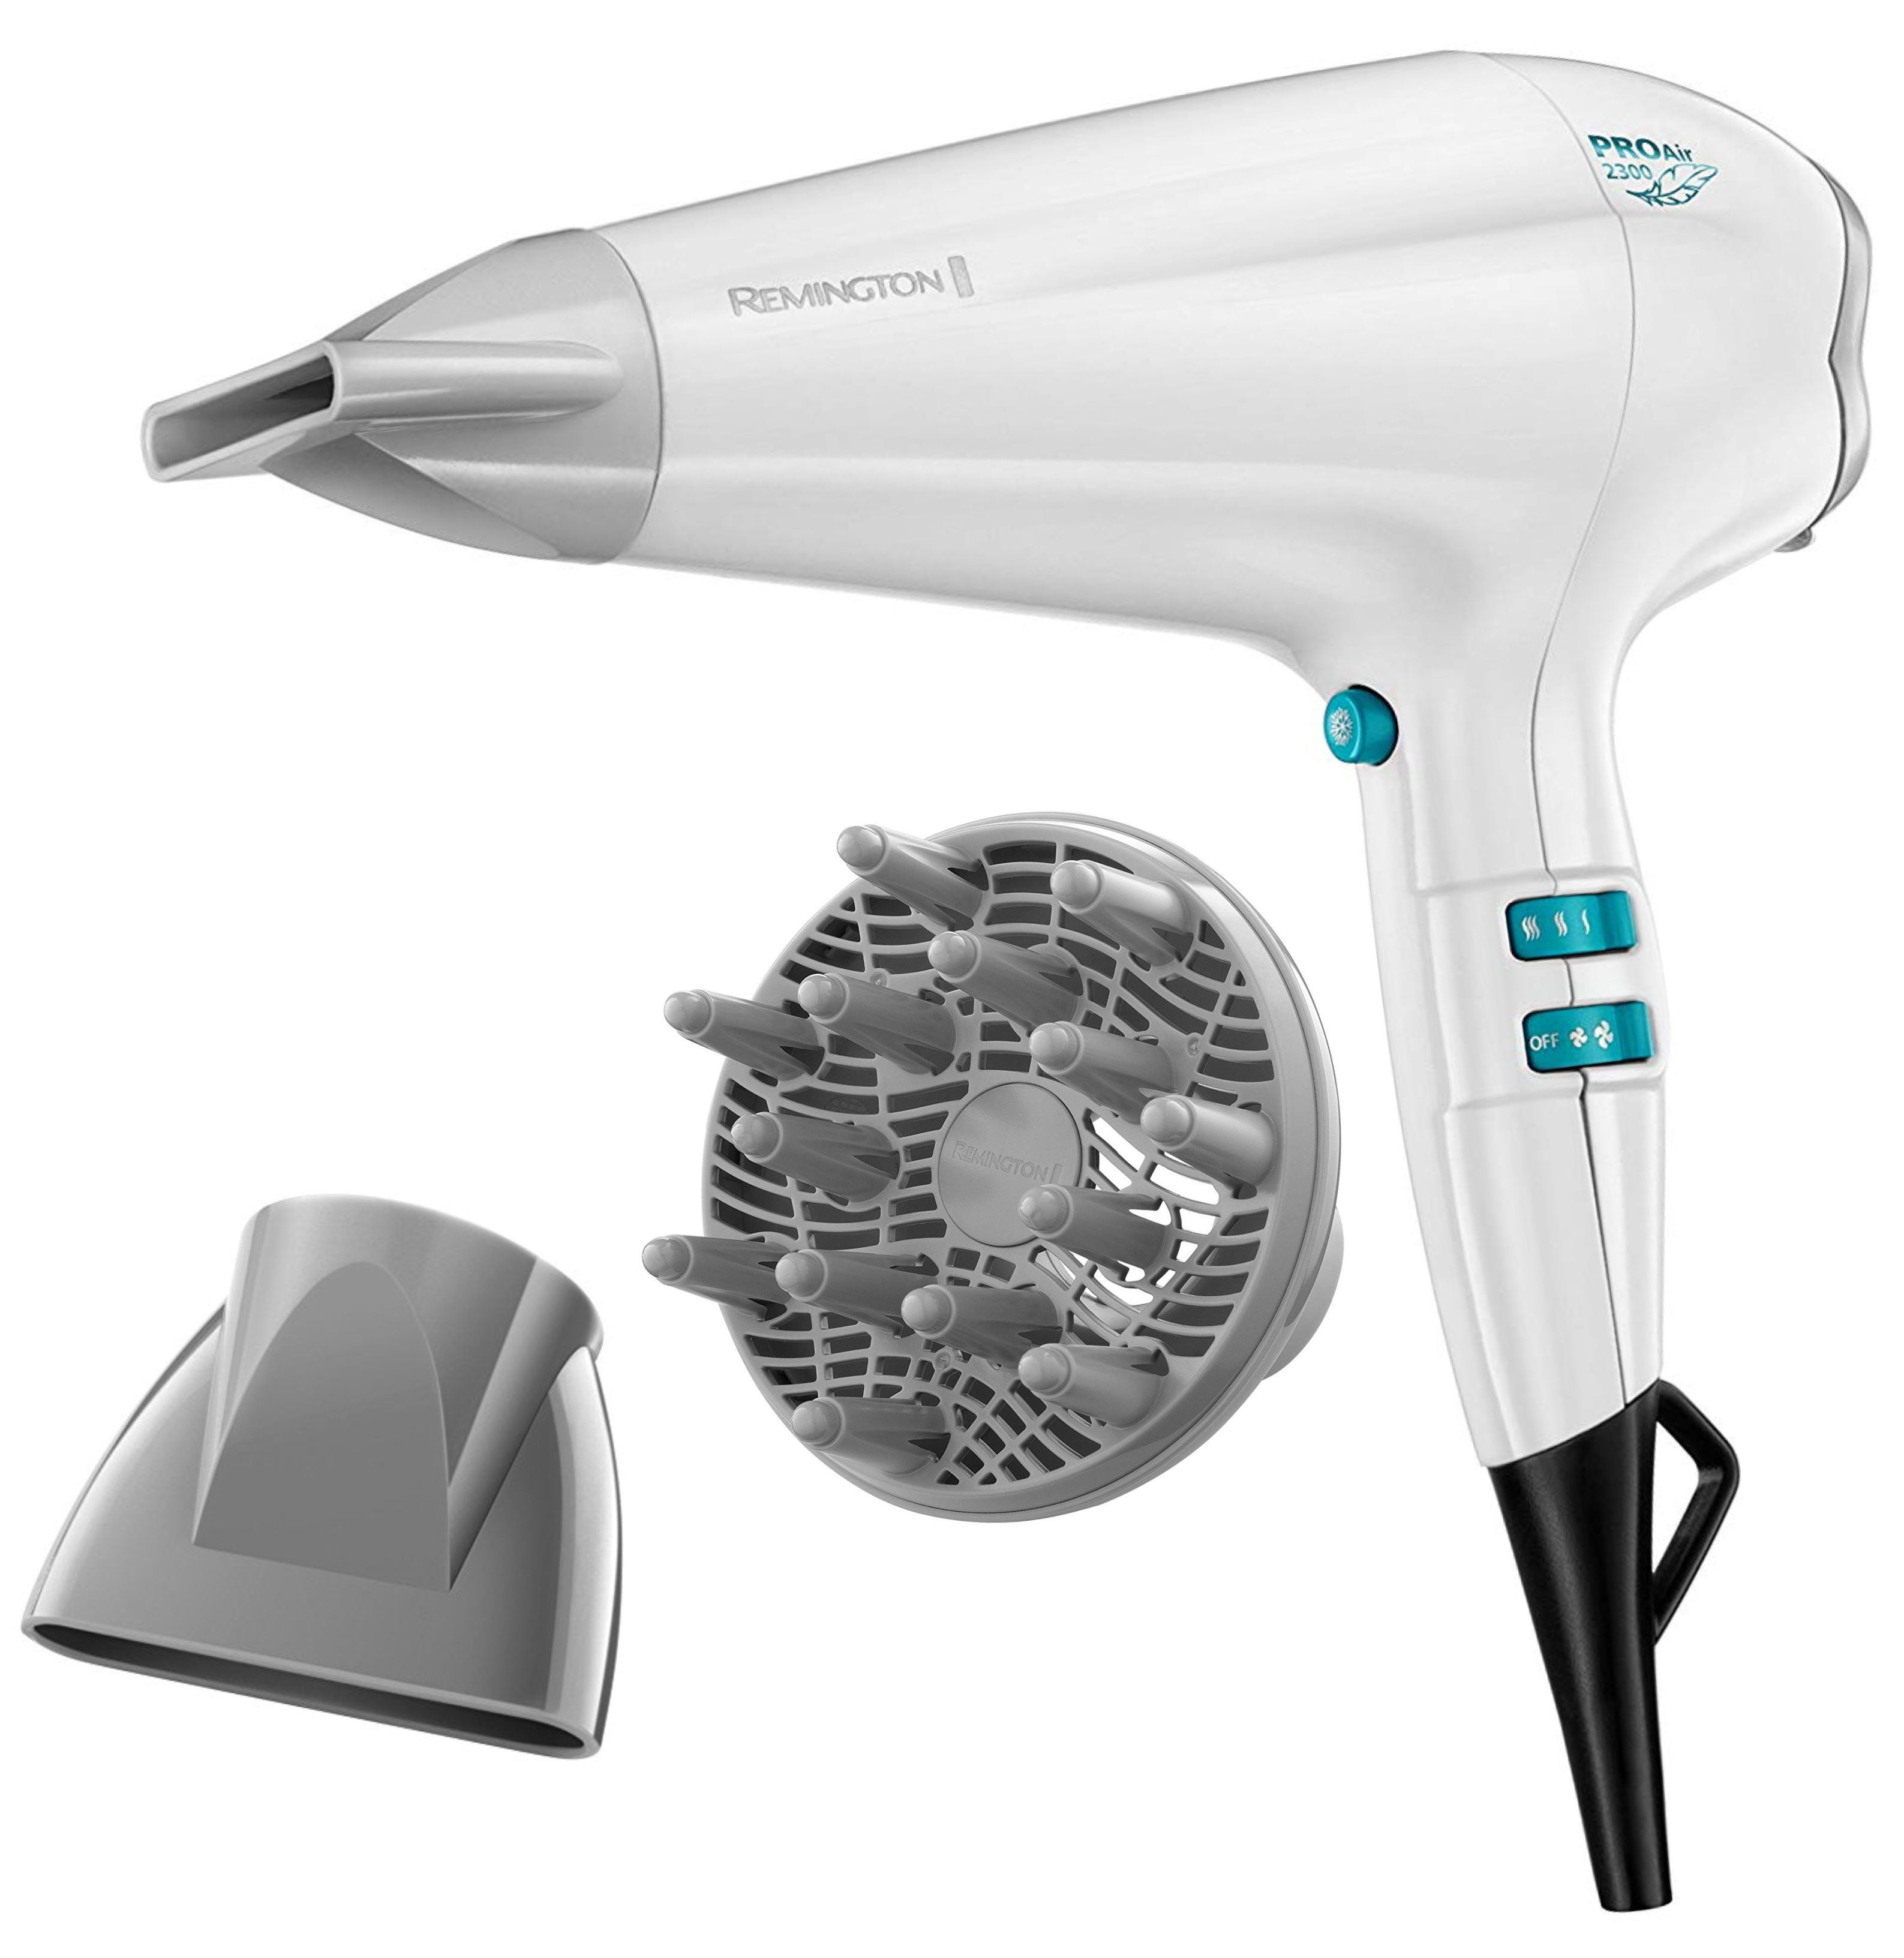 Remington Pro Air Power Hair Dryer | Ionic Conditioning | 2300W AC Motor | Lightweight